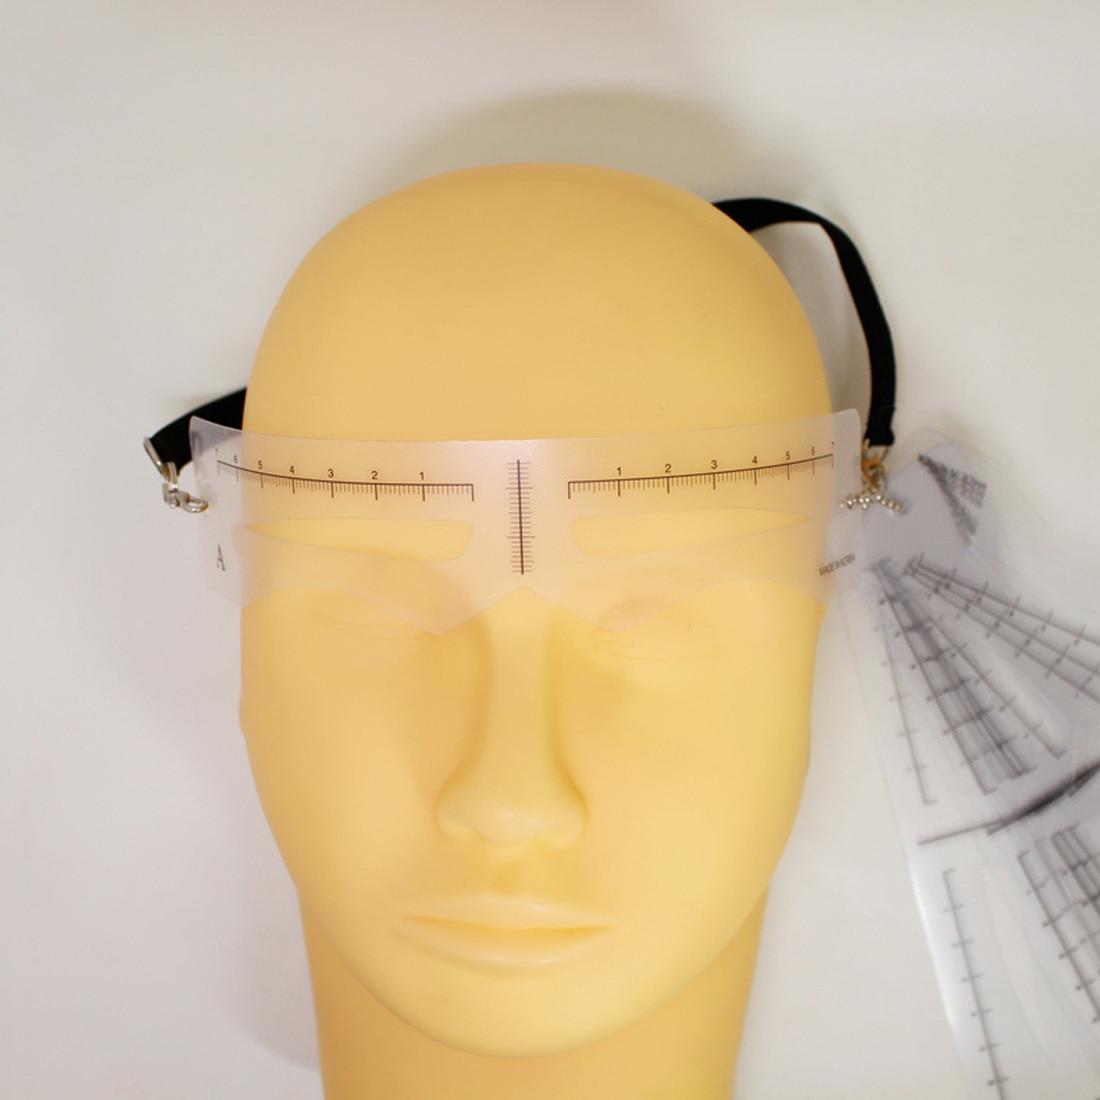 12PCS Useful Easy to Use Eyebrow Shaper Makeup Template ...